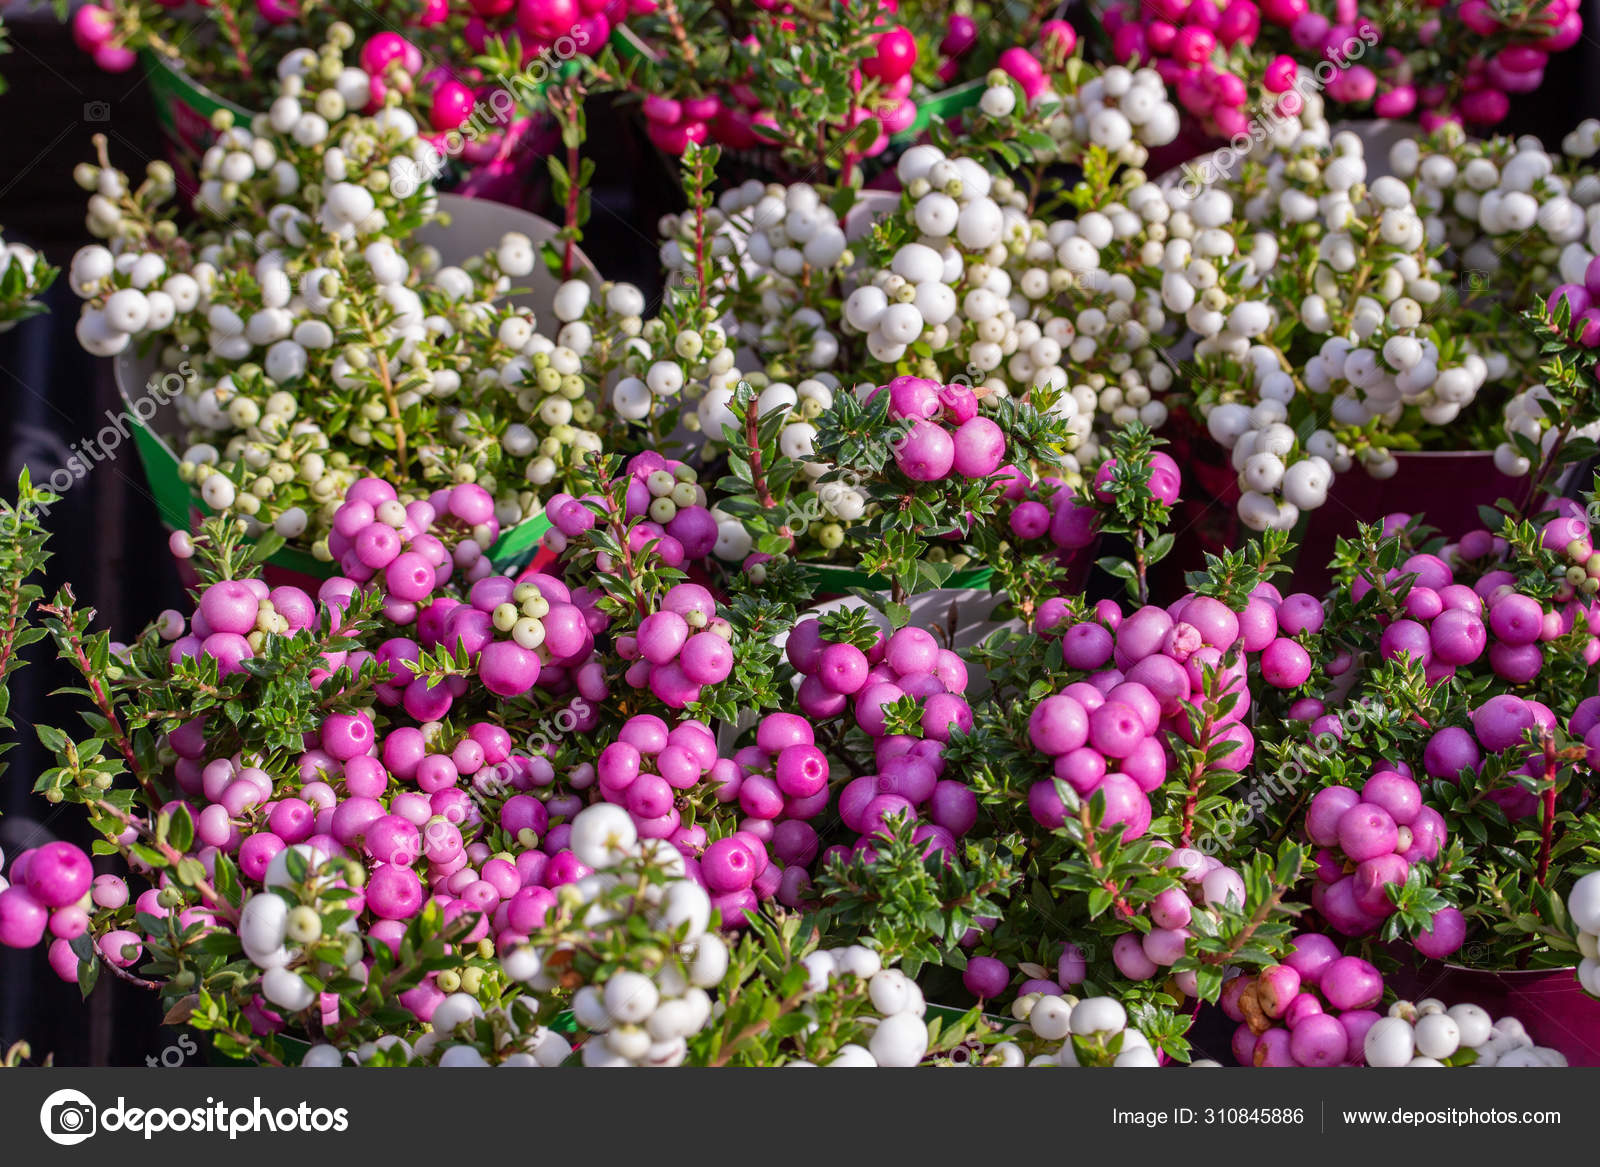 Gaultheria Pernettya.Gaultheria Mucronata Berry Fruit White Pink Purple Pernettya Gaultheria Potted Plant Background Horizontal Vegetable Wallpaper Stock Photo C Olakorica 310845886